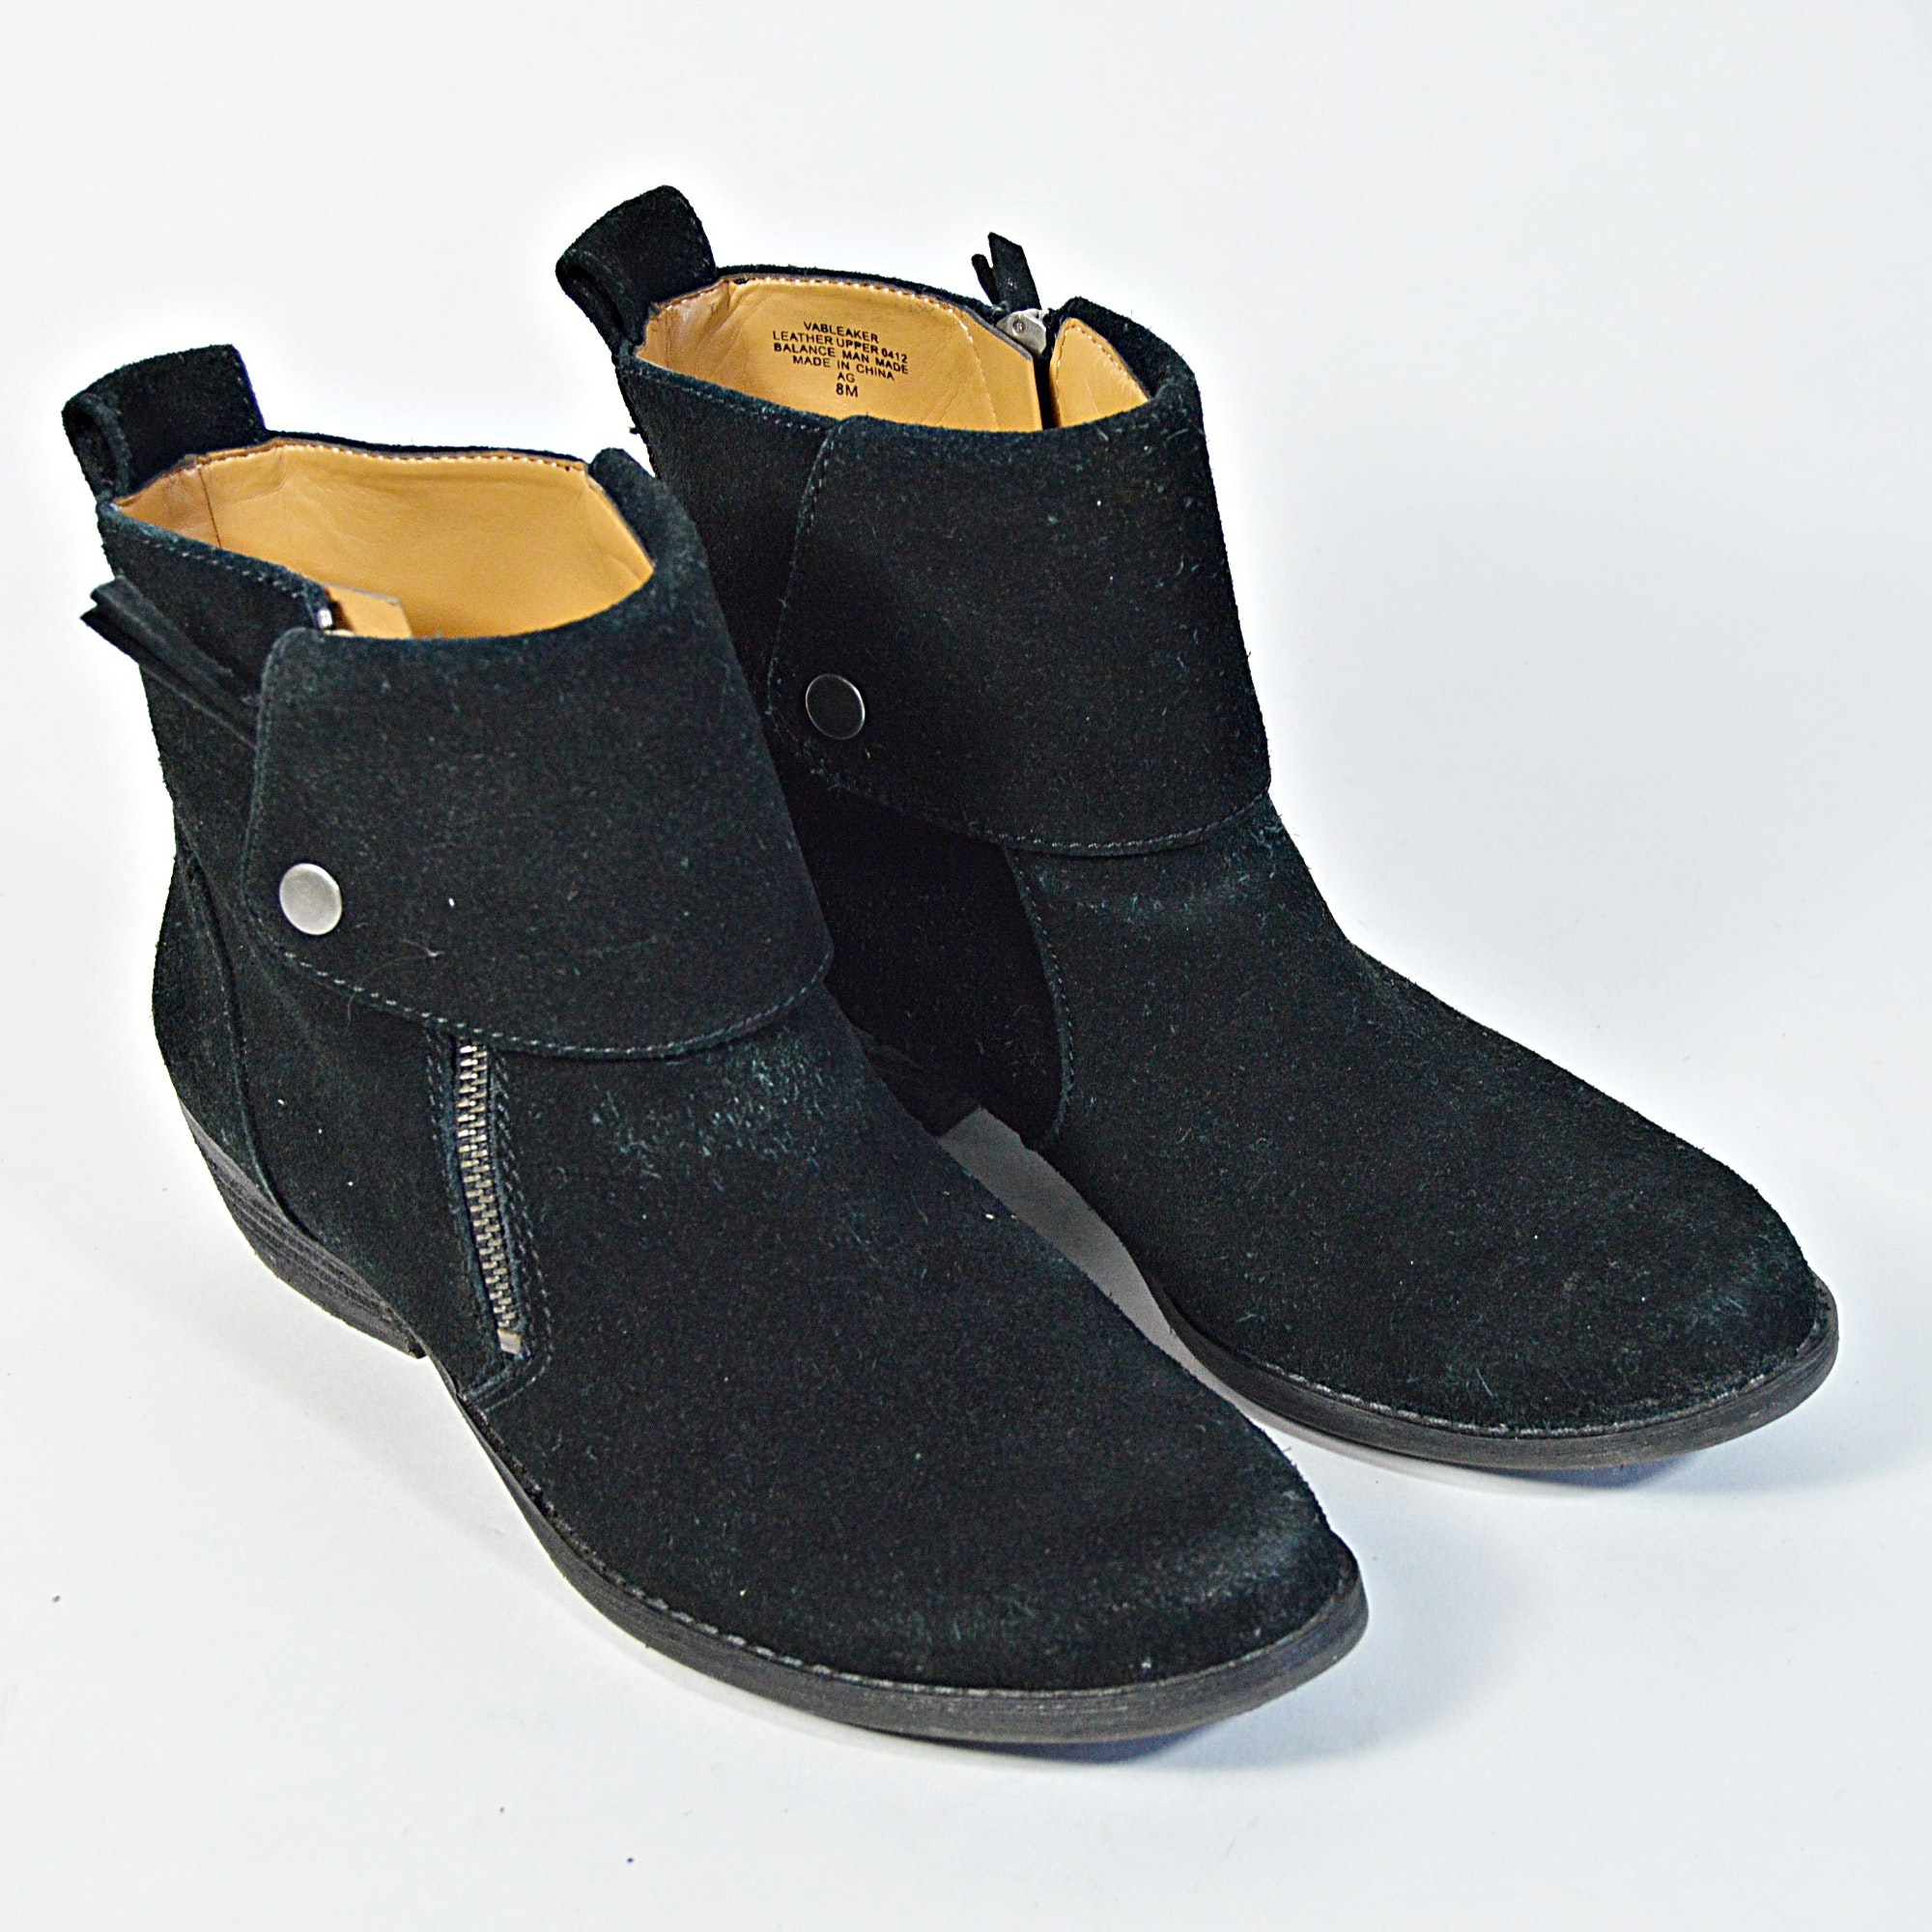 Nine West Black Leather Boots, 8M